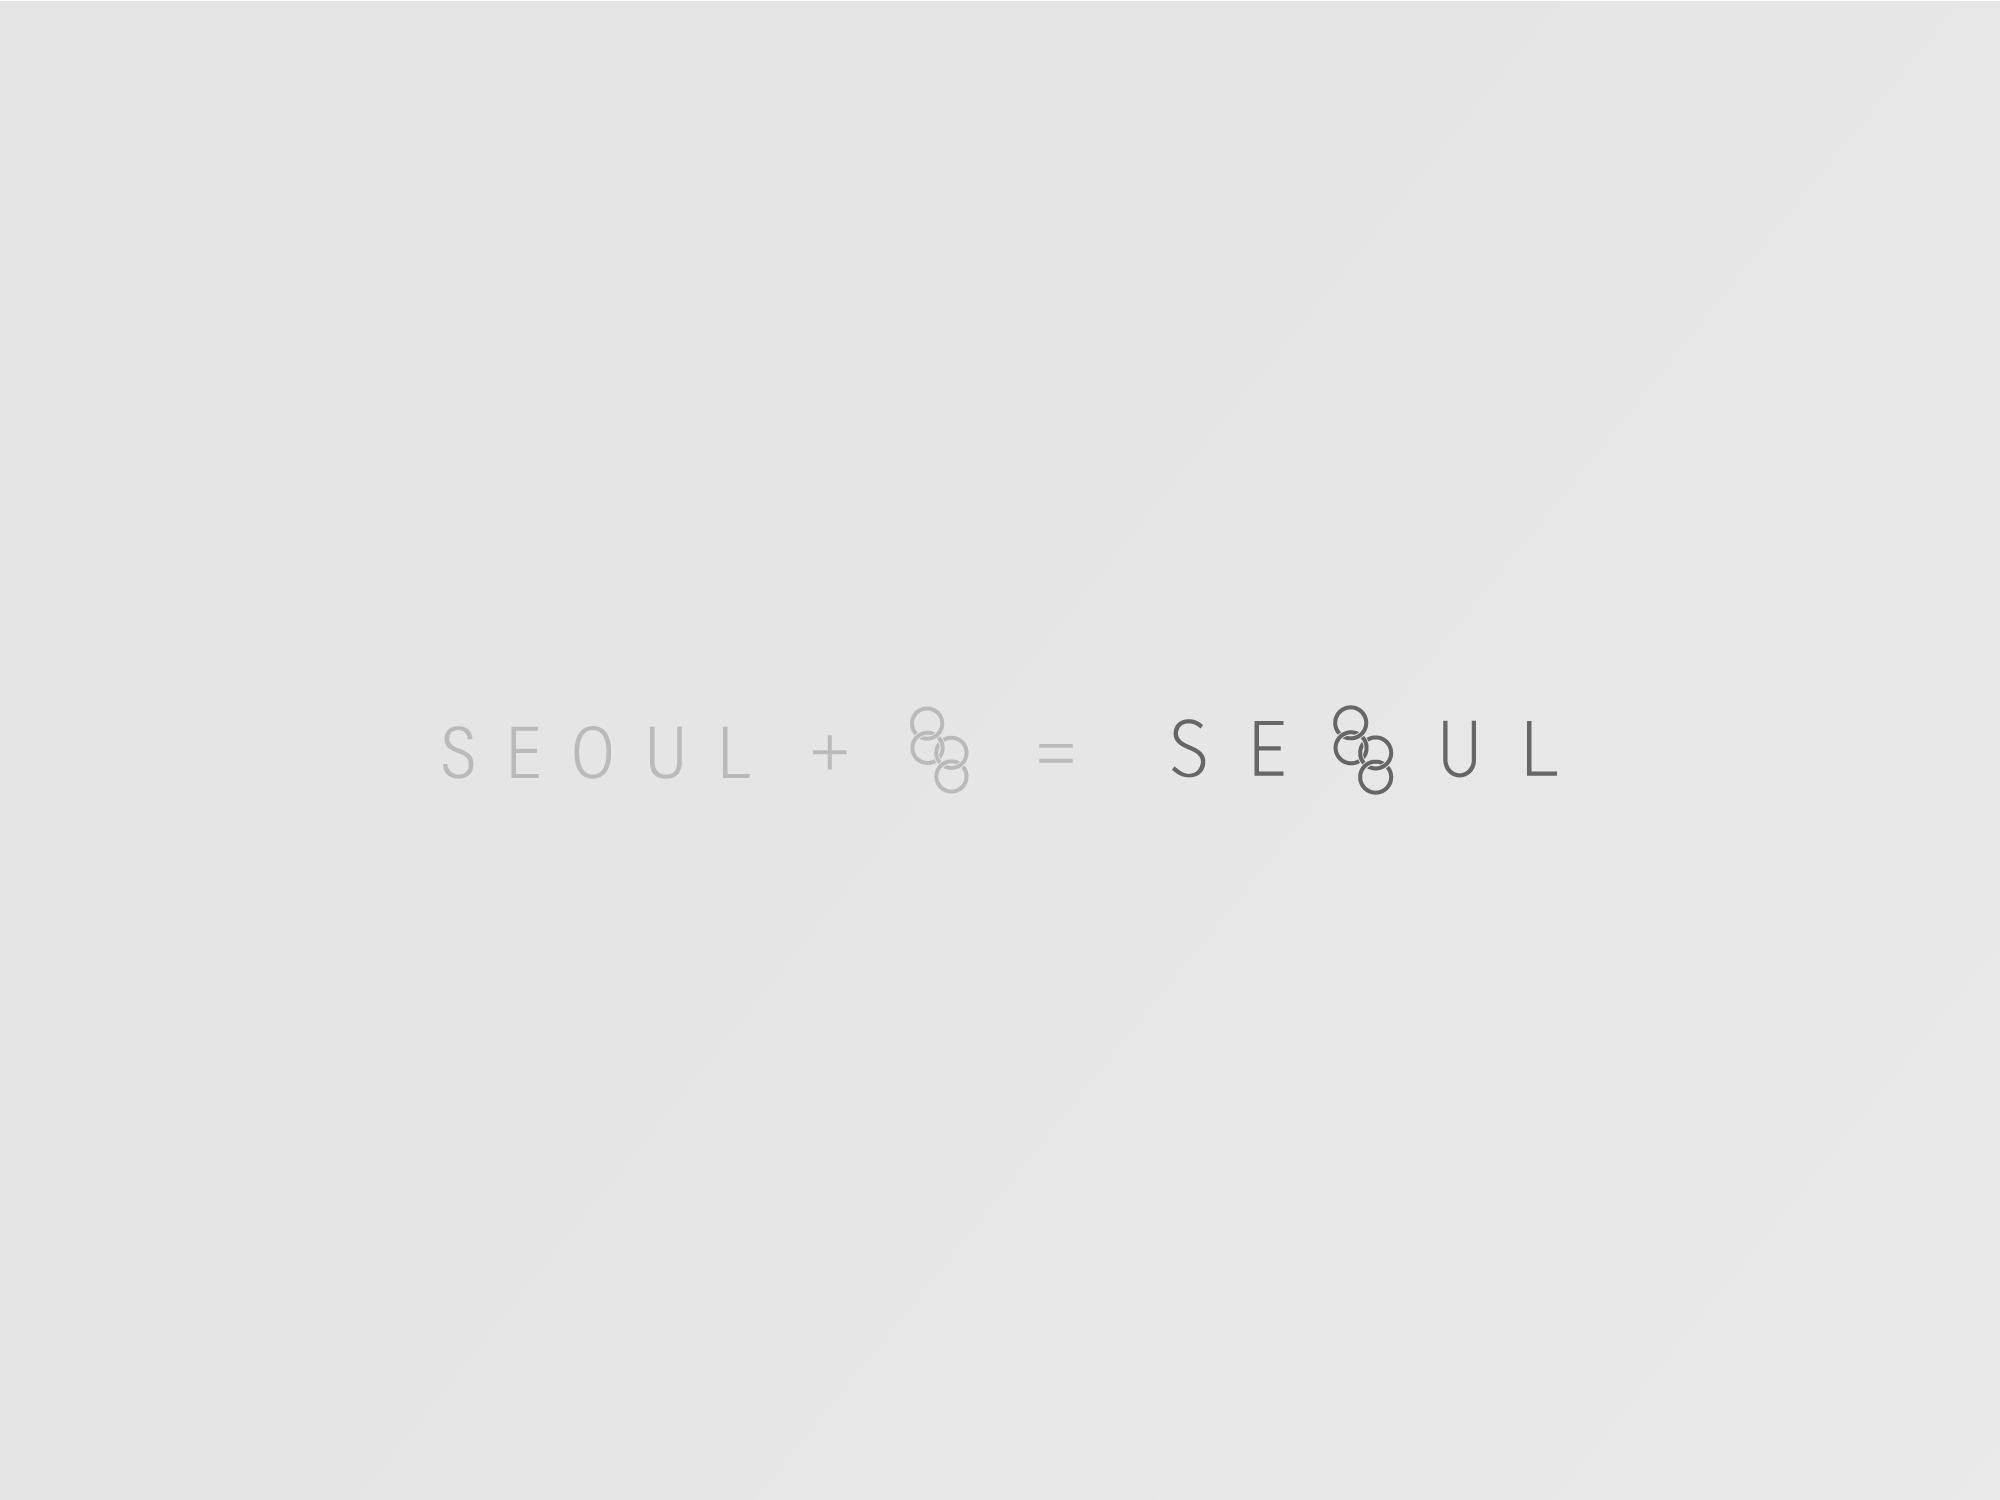 88 Seoul Running Club